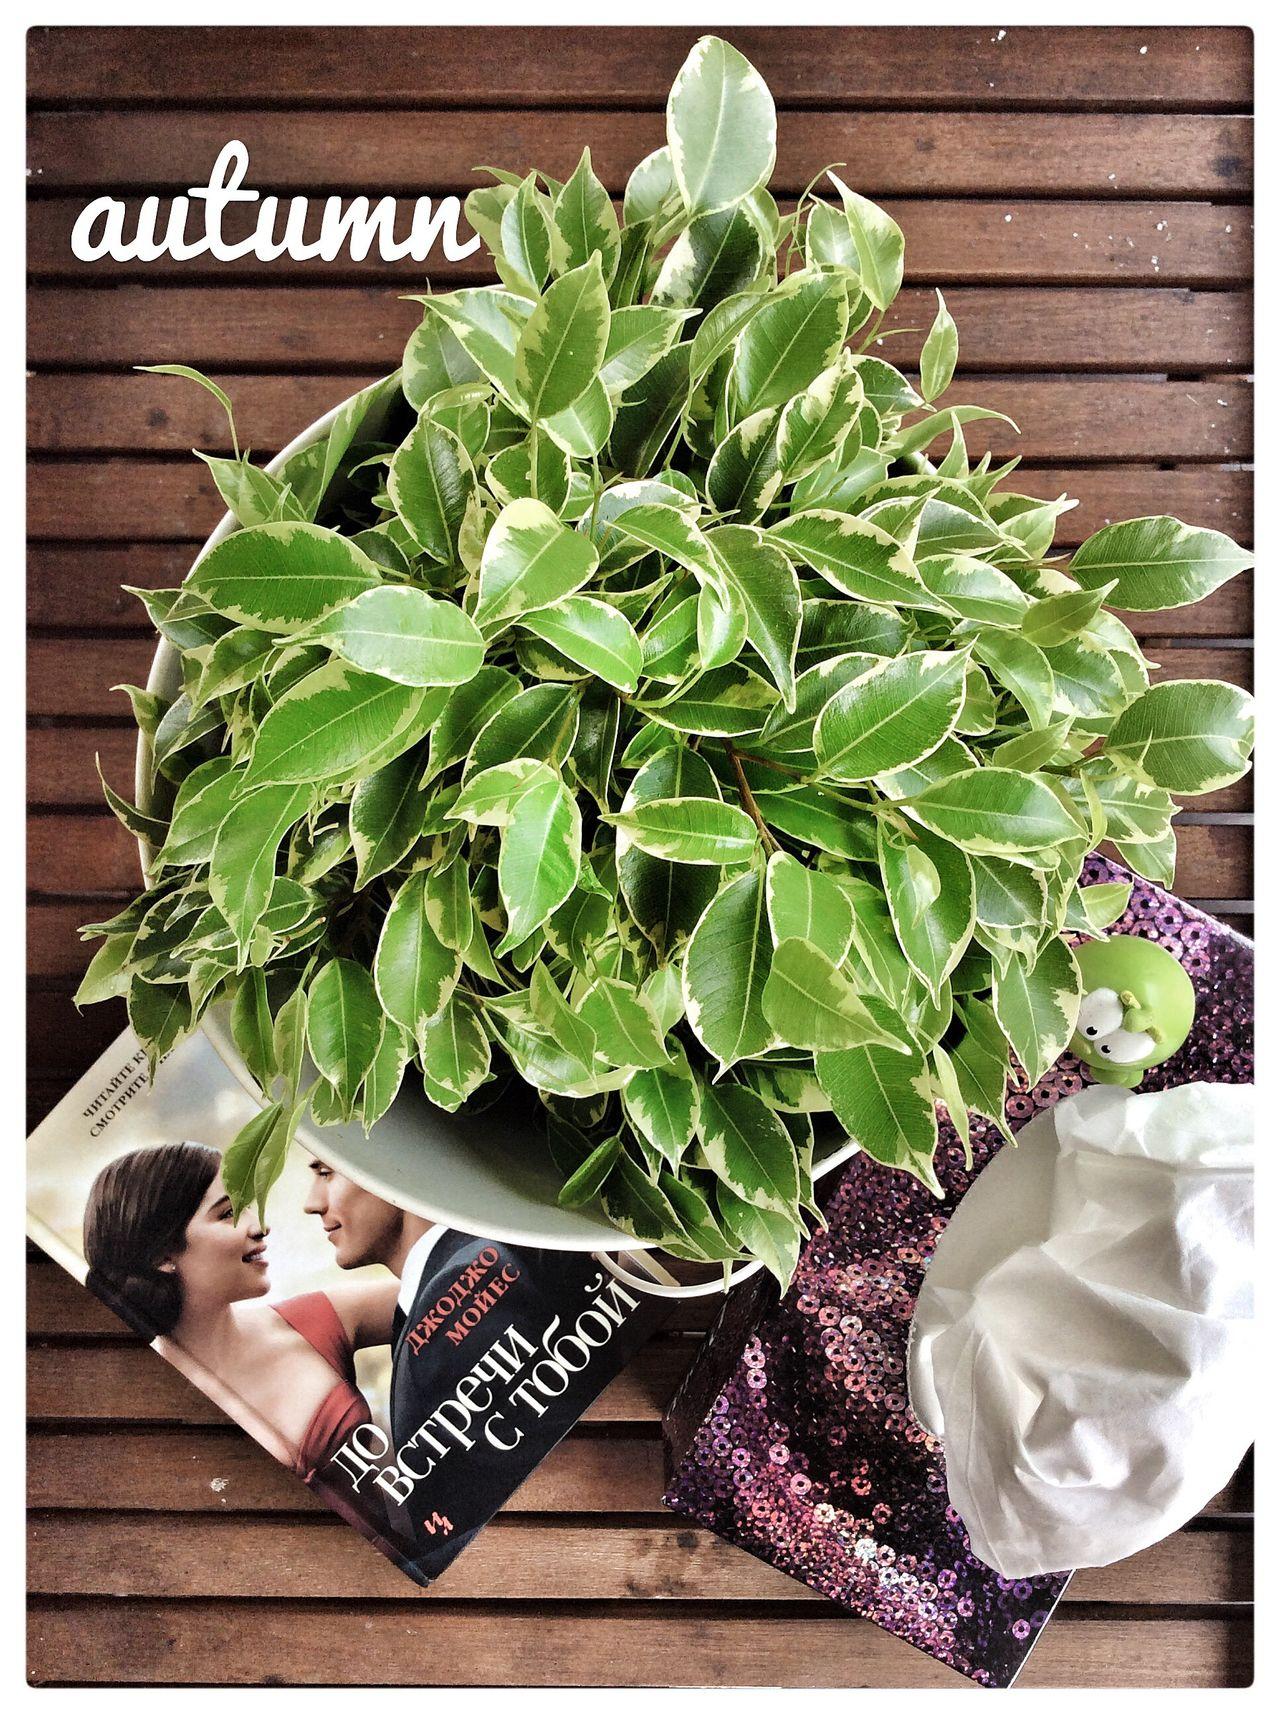 Autumn Flower Book Papers до встречи с тобой Me Before You